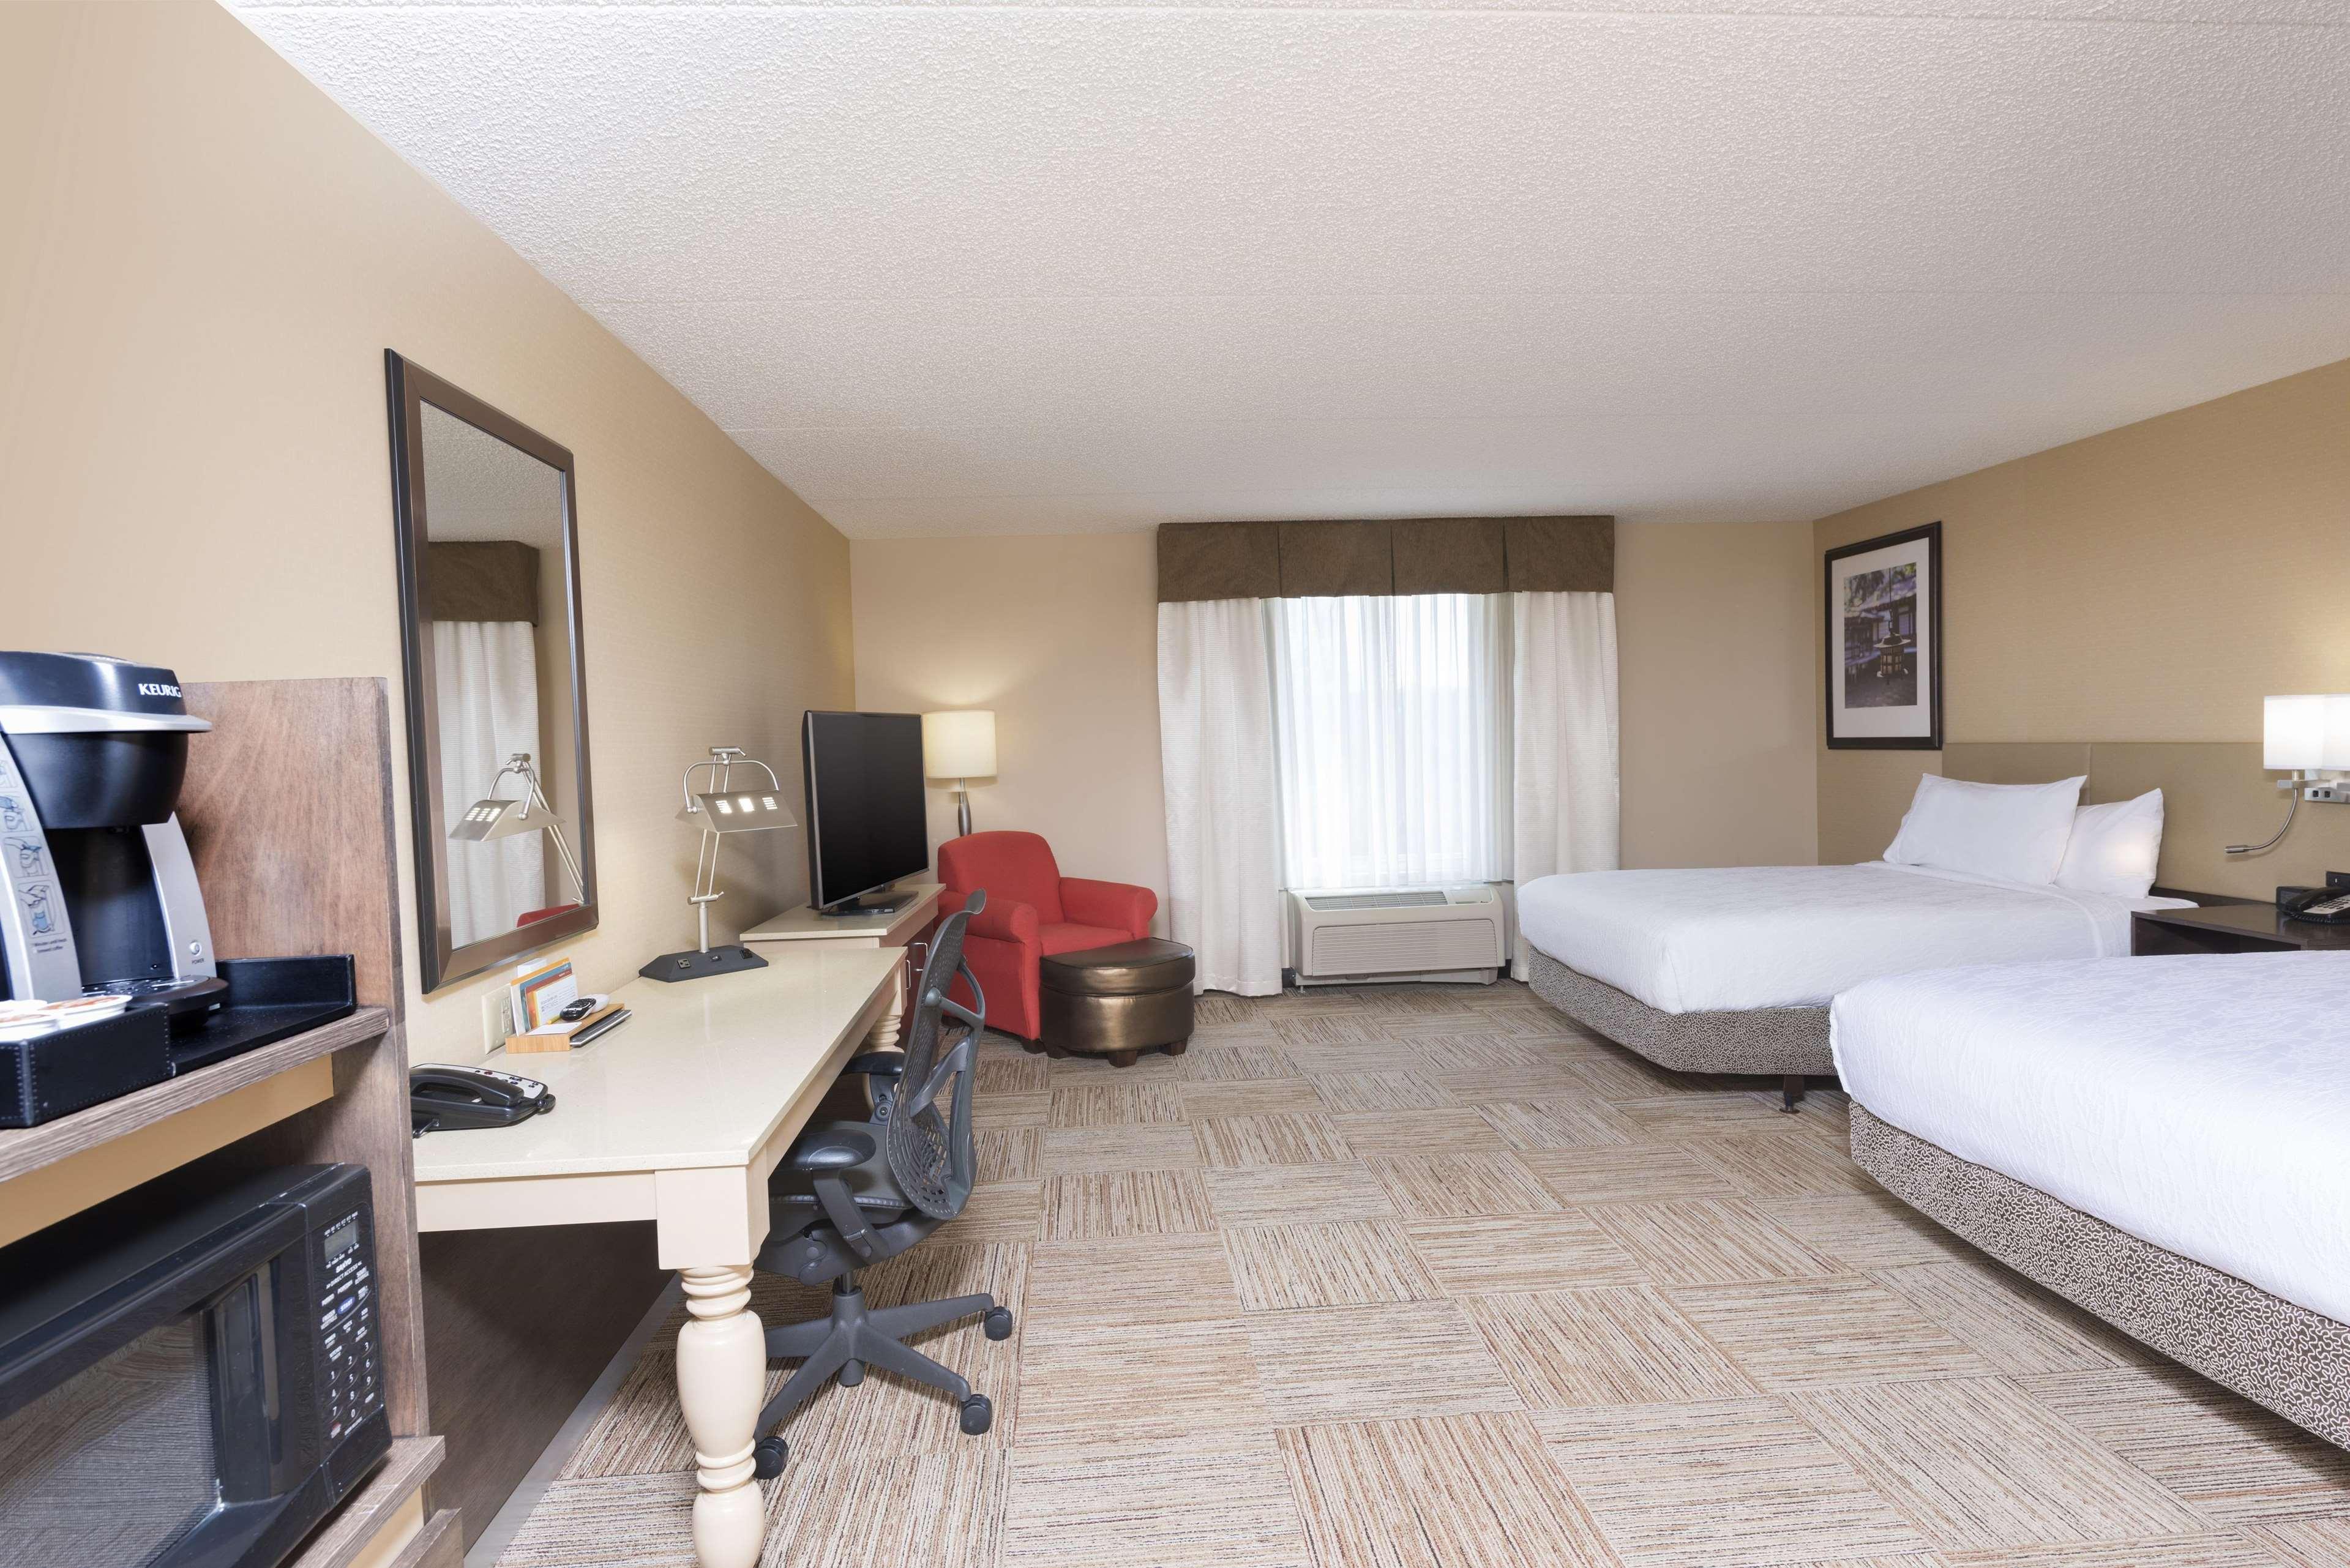 Hilton Garden Inn West Lafayette Wabash Landing image 43